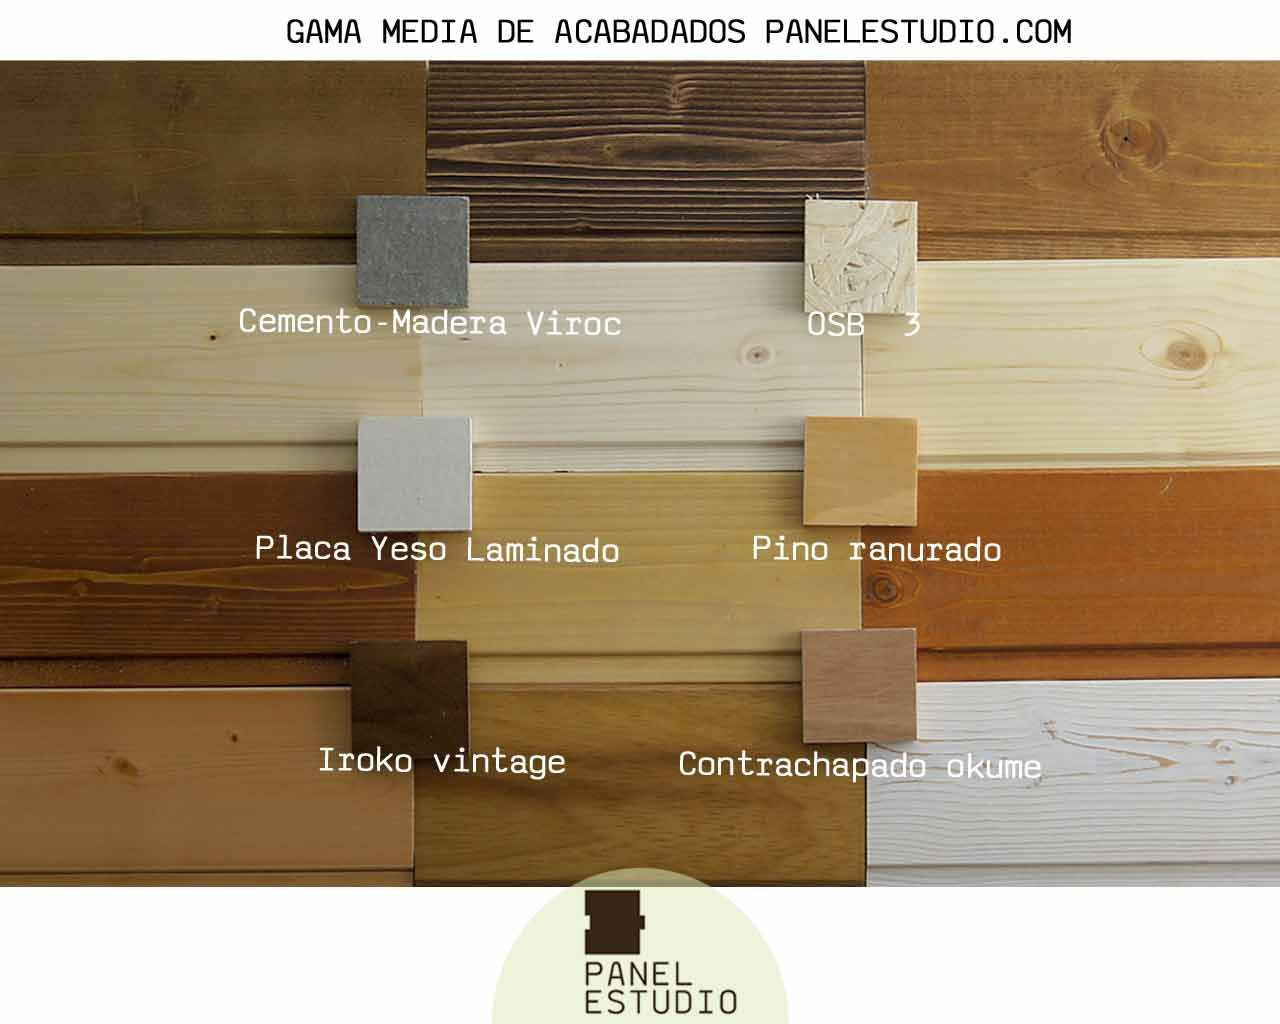 Gama de colores de paneles de madera decorativos gama - Tejados de madera ...